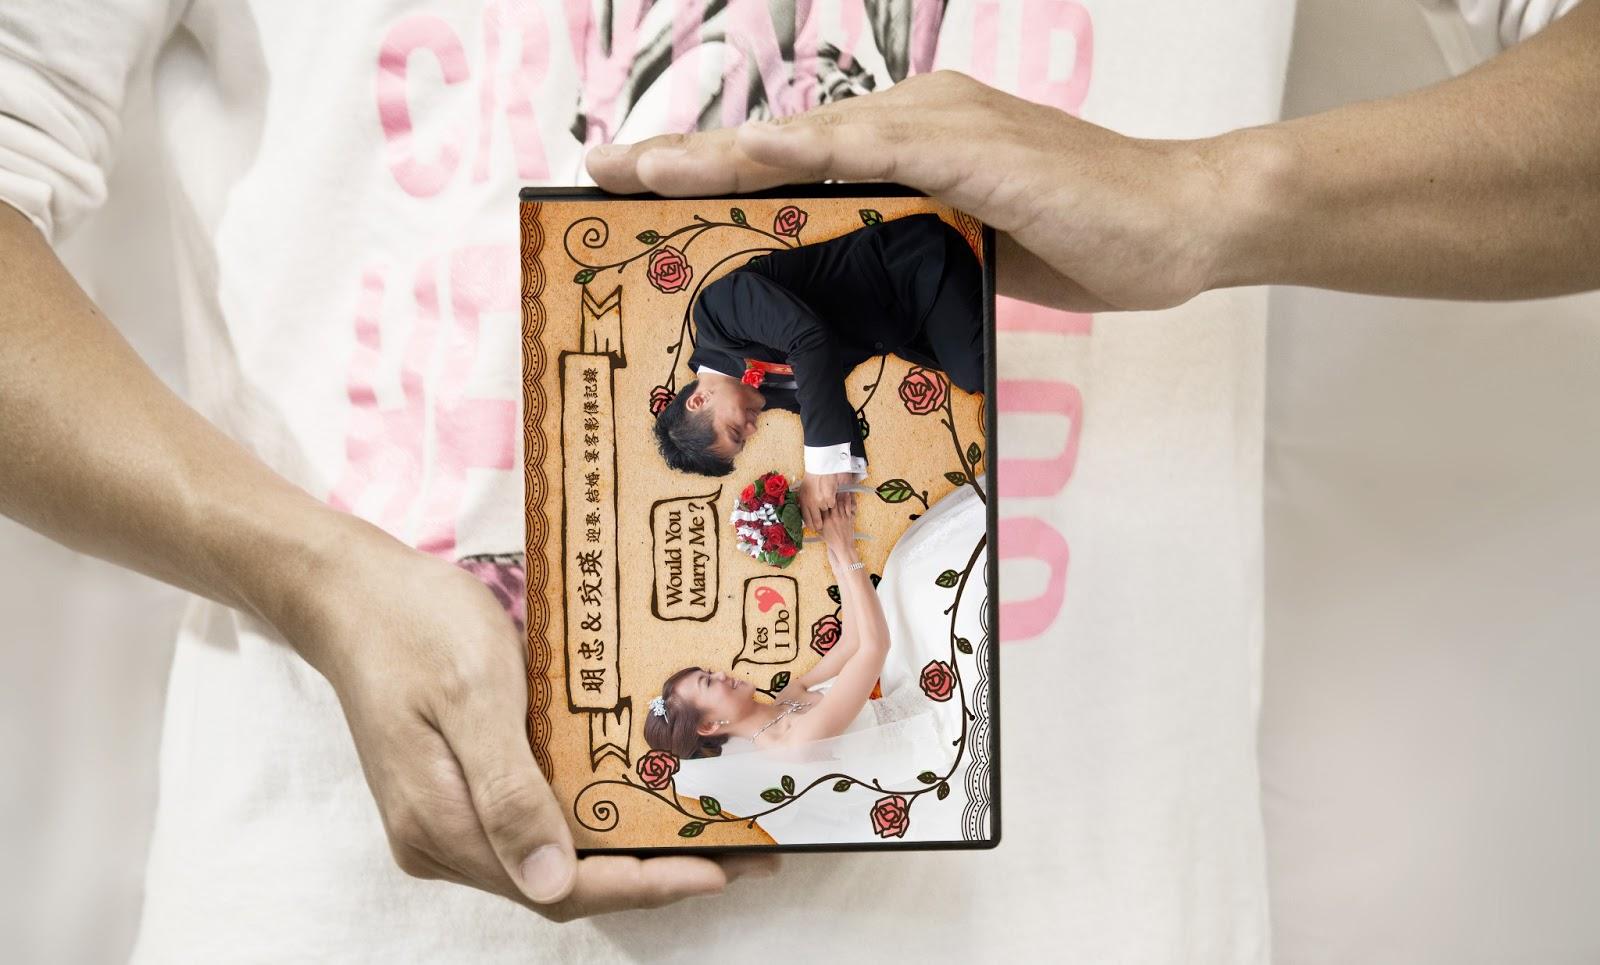 SHOWCASE作品展示 | 明忠X玟瑛婚攝DVD封面設計 by MUMULab.com